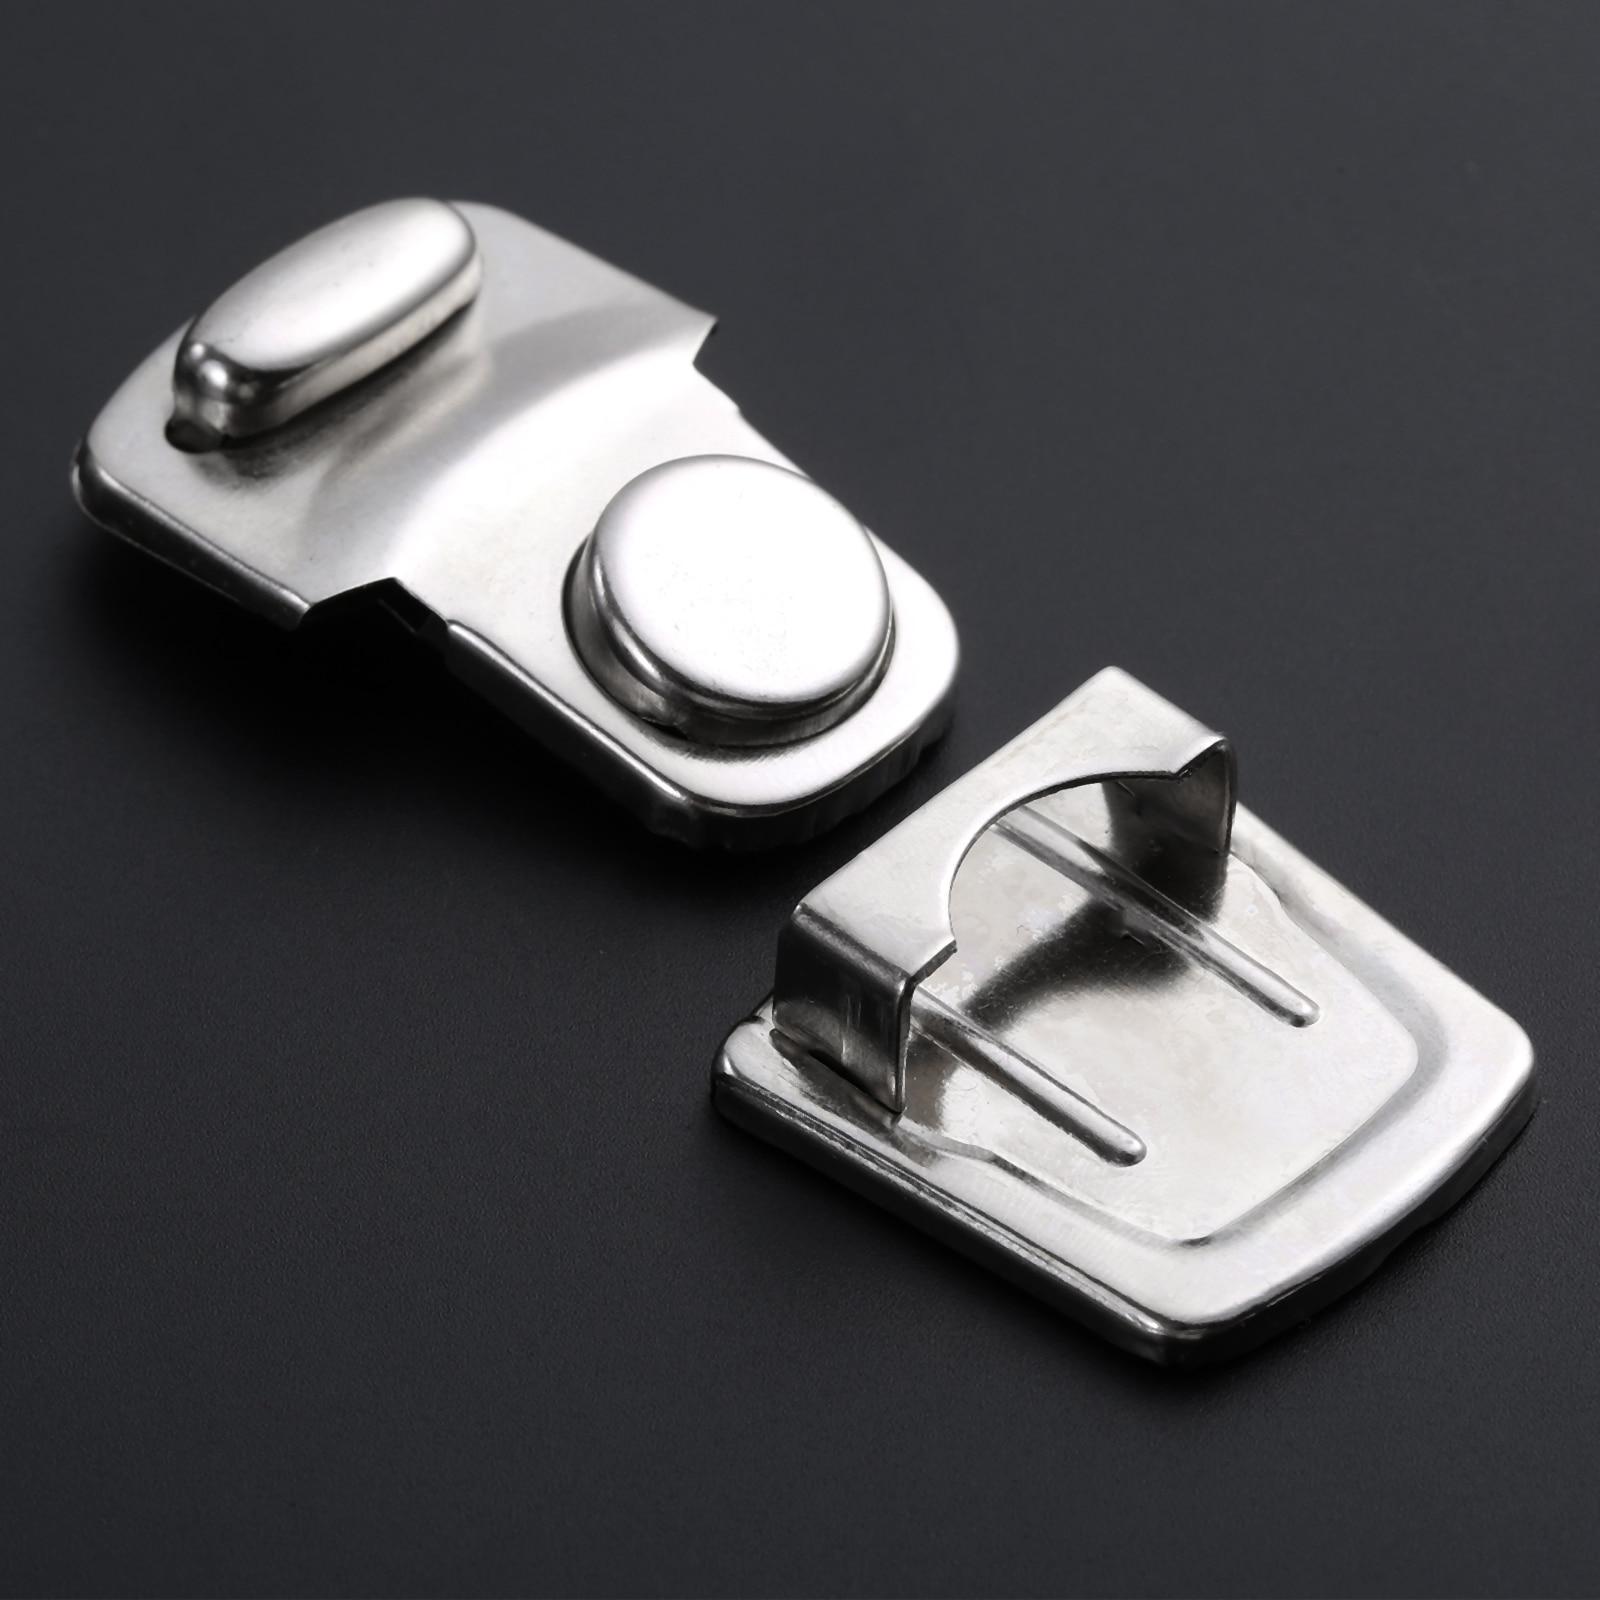 2//10Pcs 28*45mm Jewelry Buckle Antique Suitcase Case Lock Hasp Latch Catch Clasp